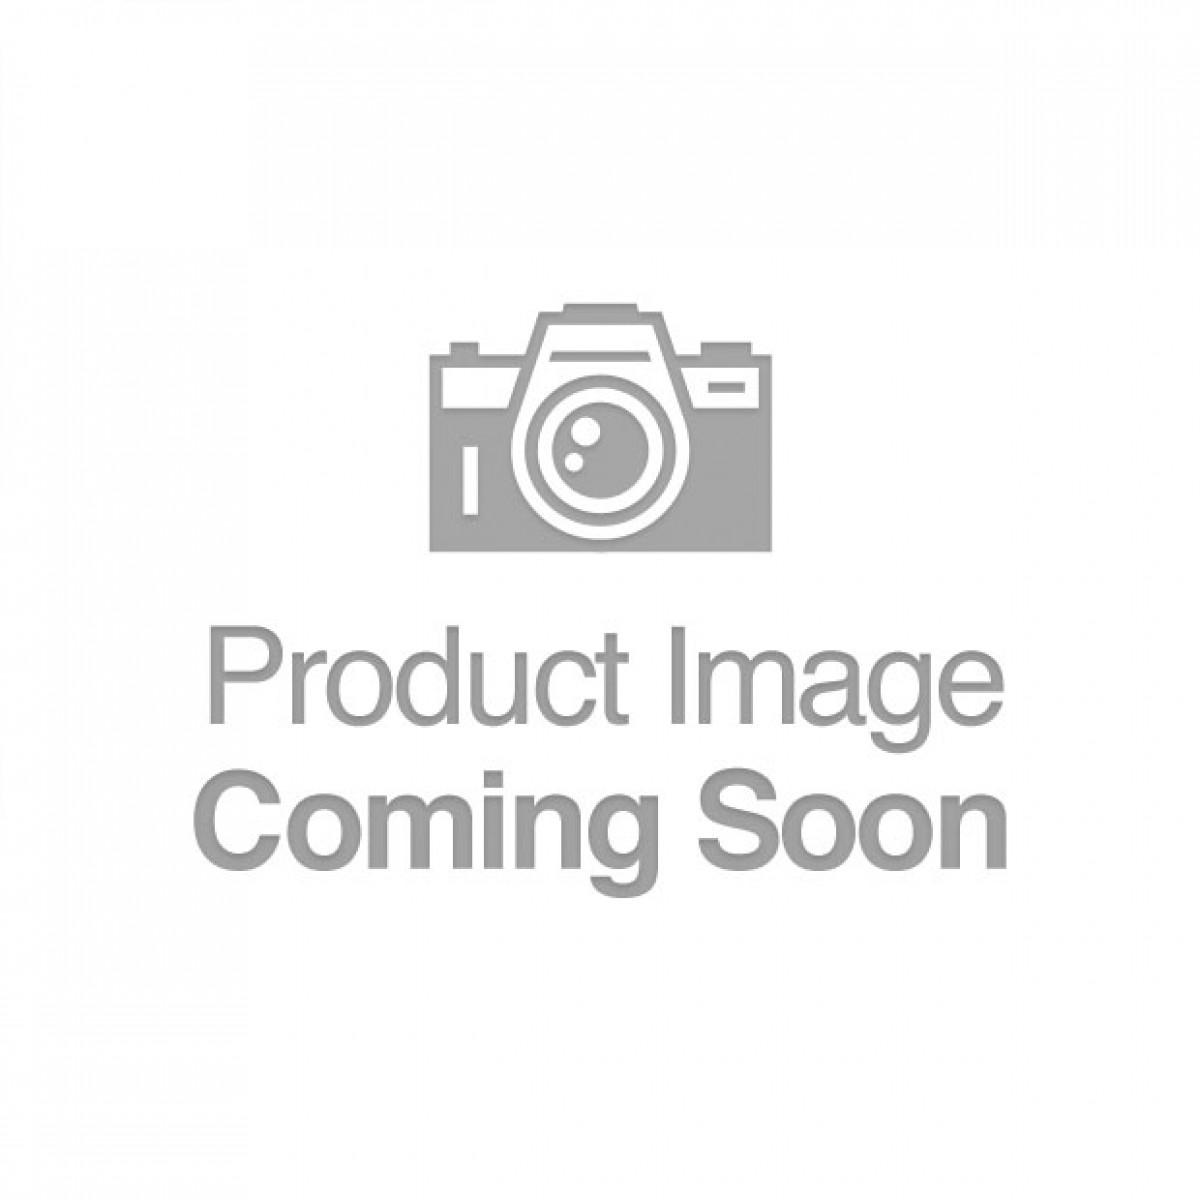 Classix Auto Vac Power Pump - Black